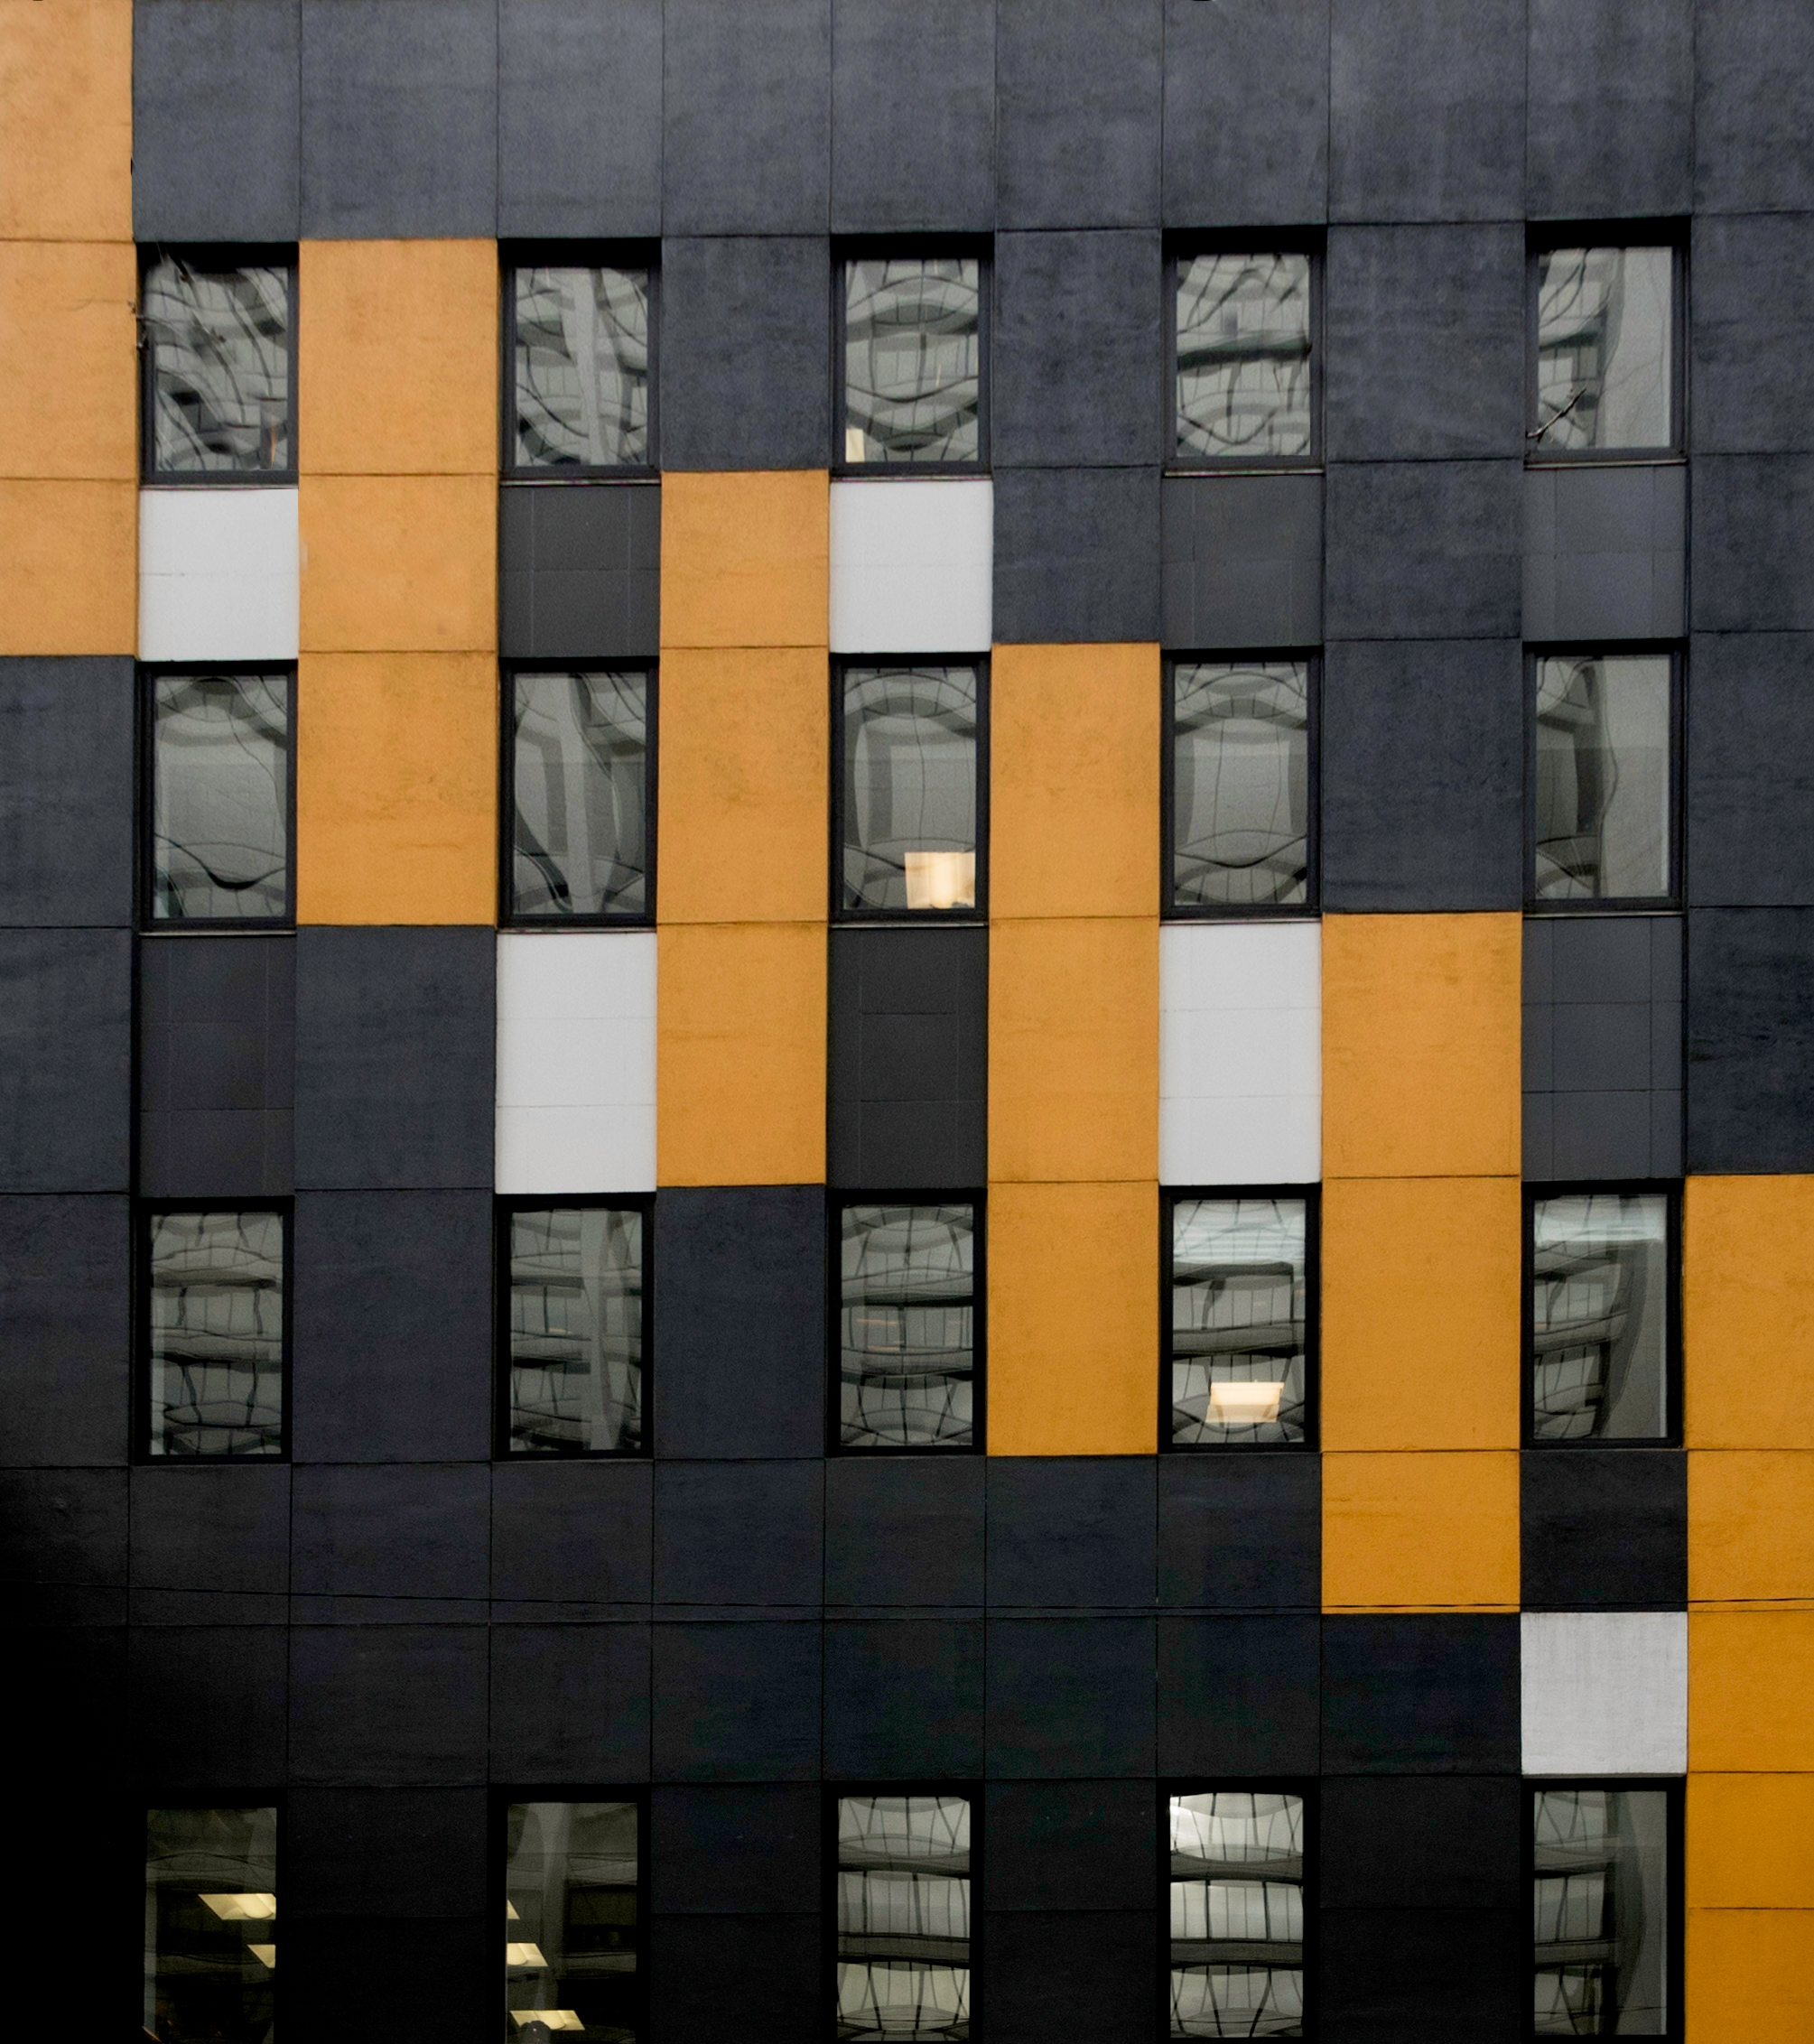 73 West Monroe Chicago Downtown - junwin | ello